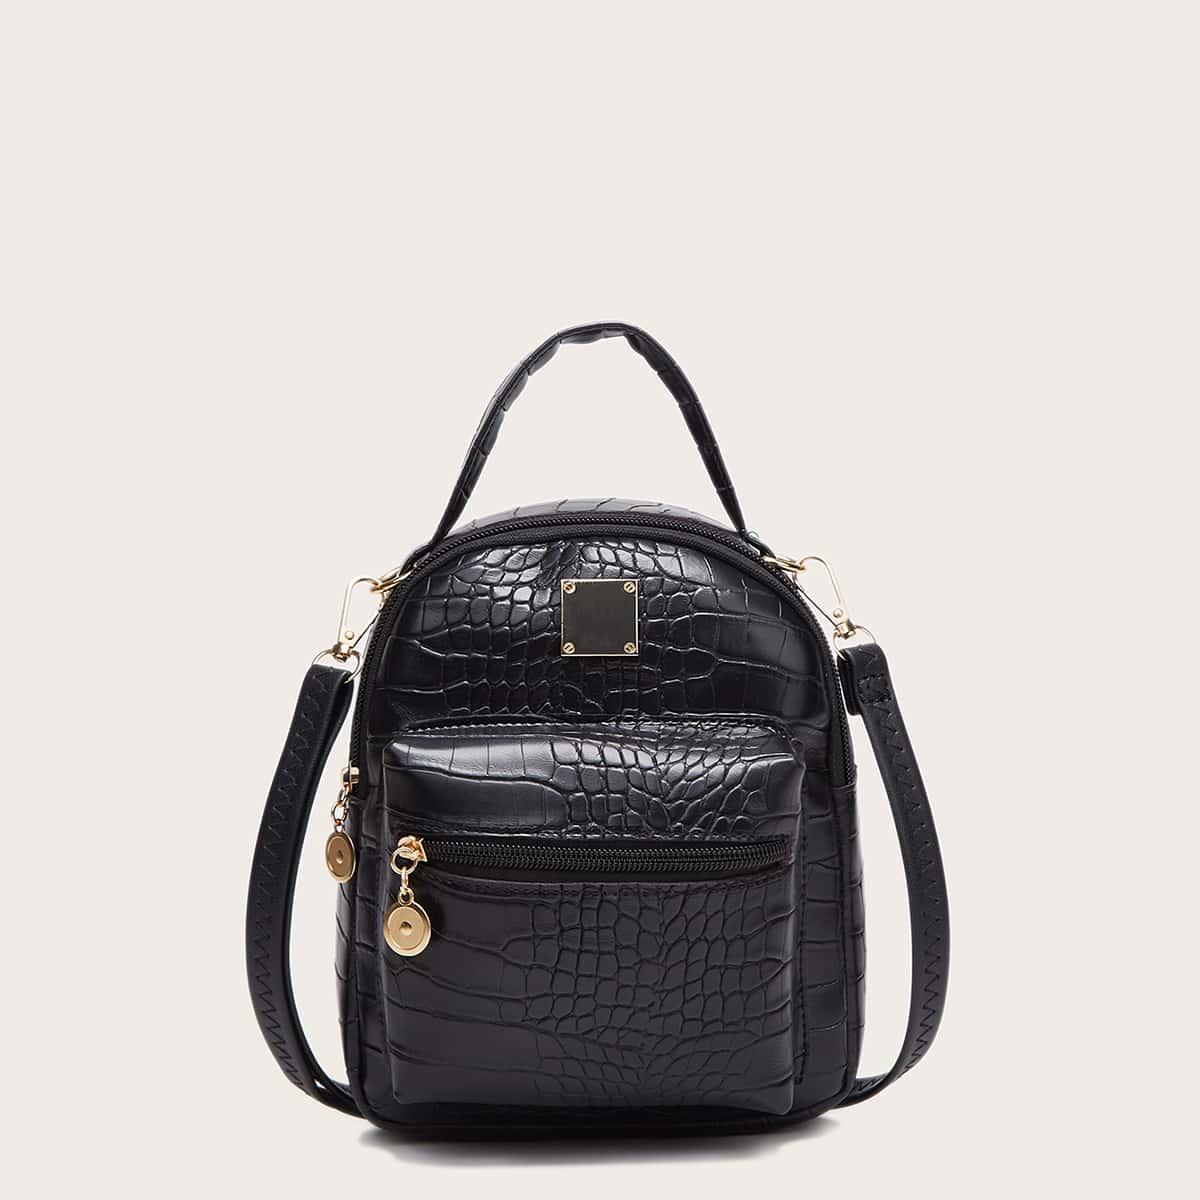 Рюкзак с карманом и тиснением под крокодила